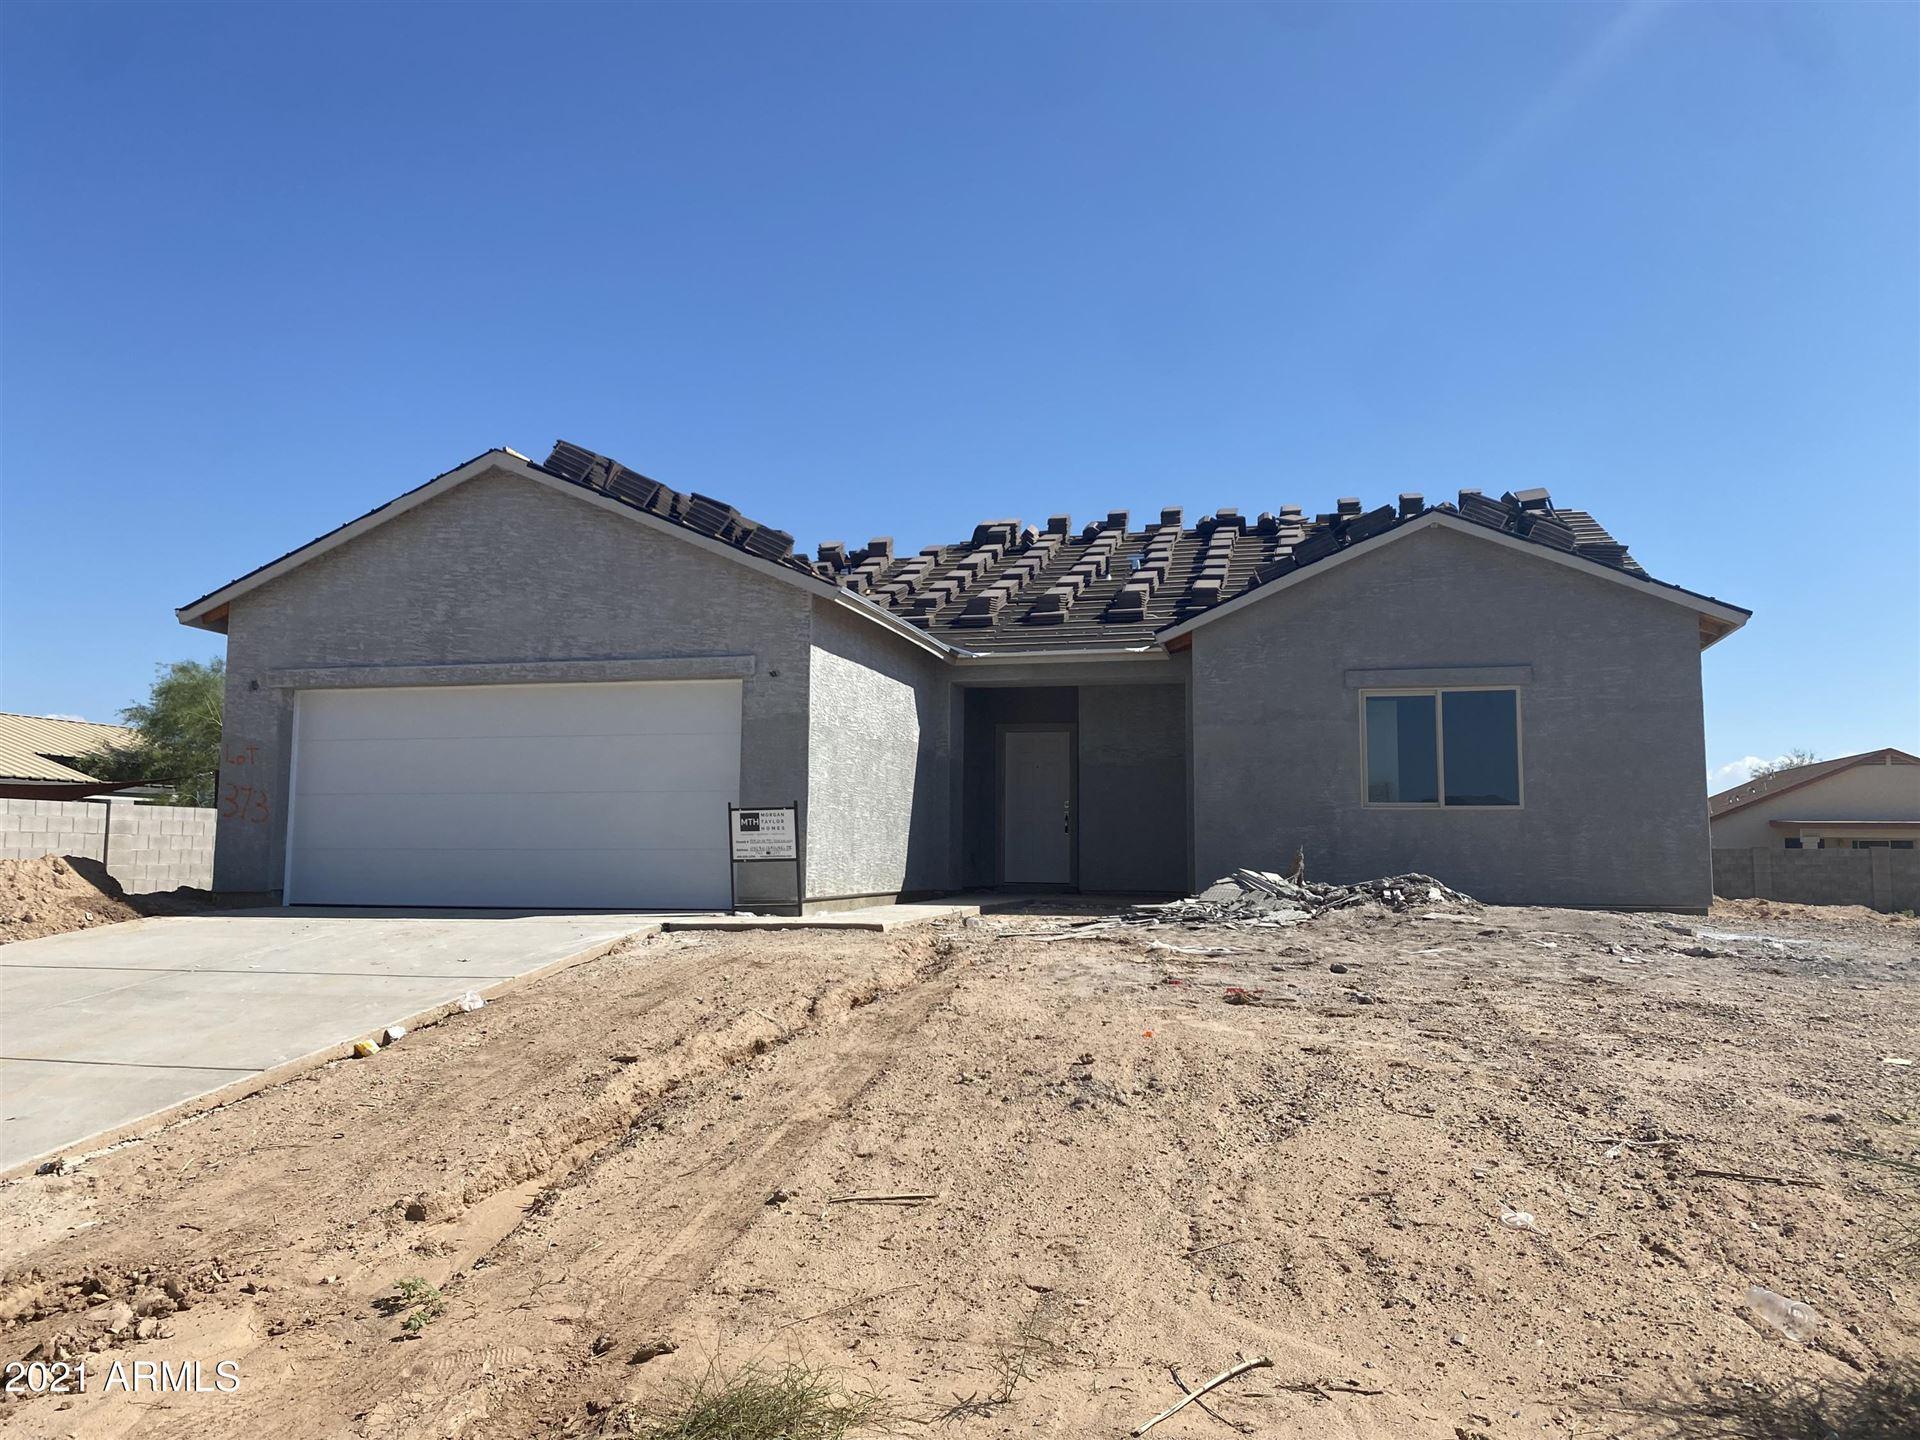 12649 W CAROUSEL Drive, Arizona City, AZ 85123 - MLS#: 6294590